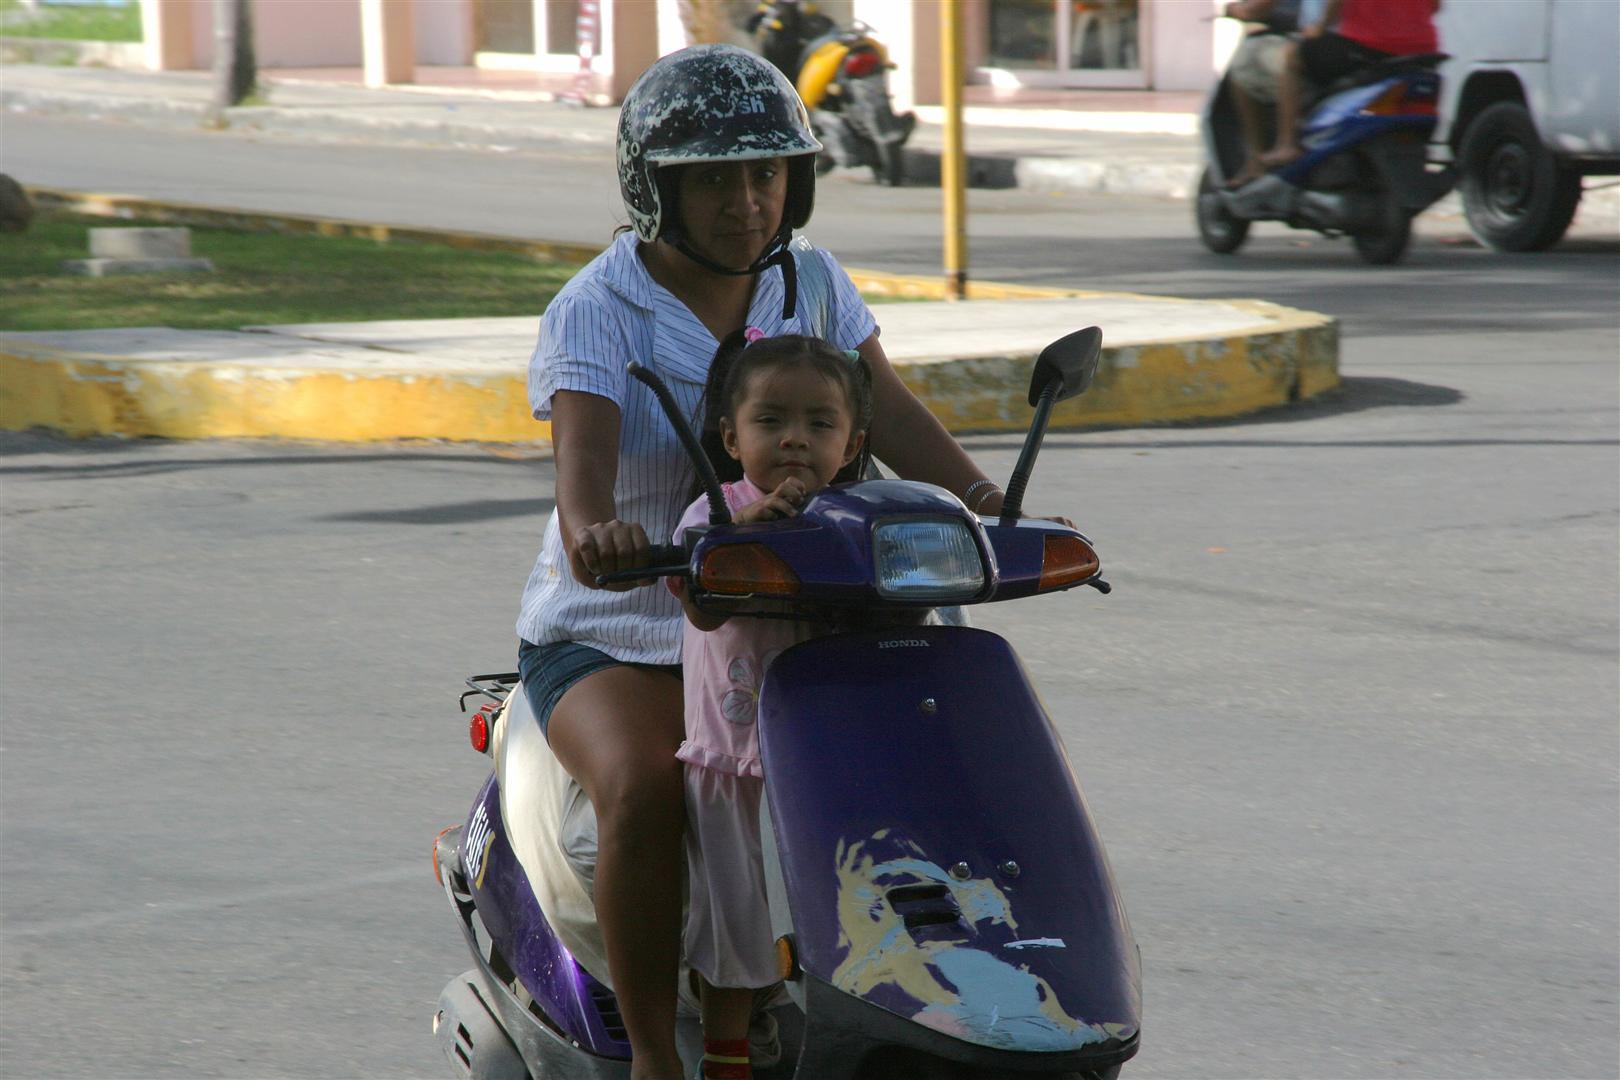 helmet law violation